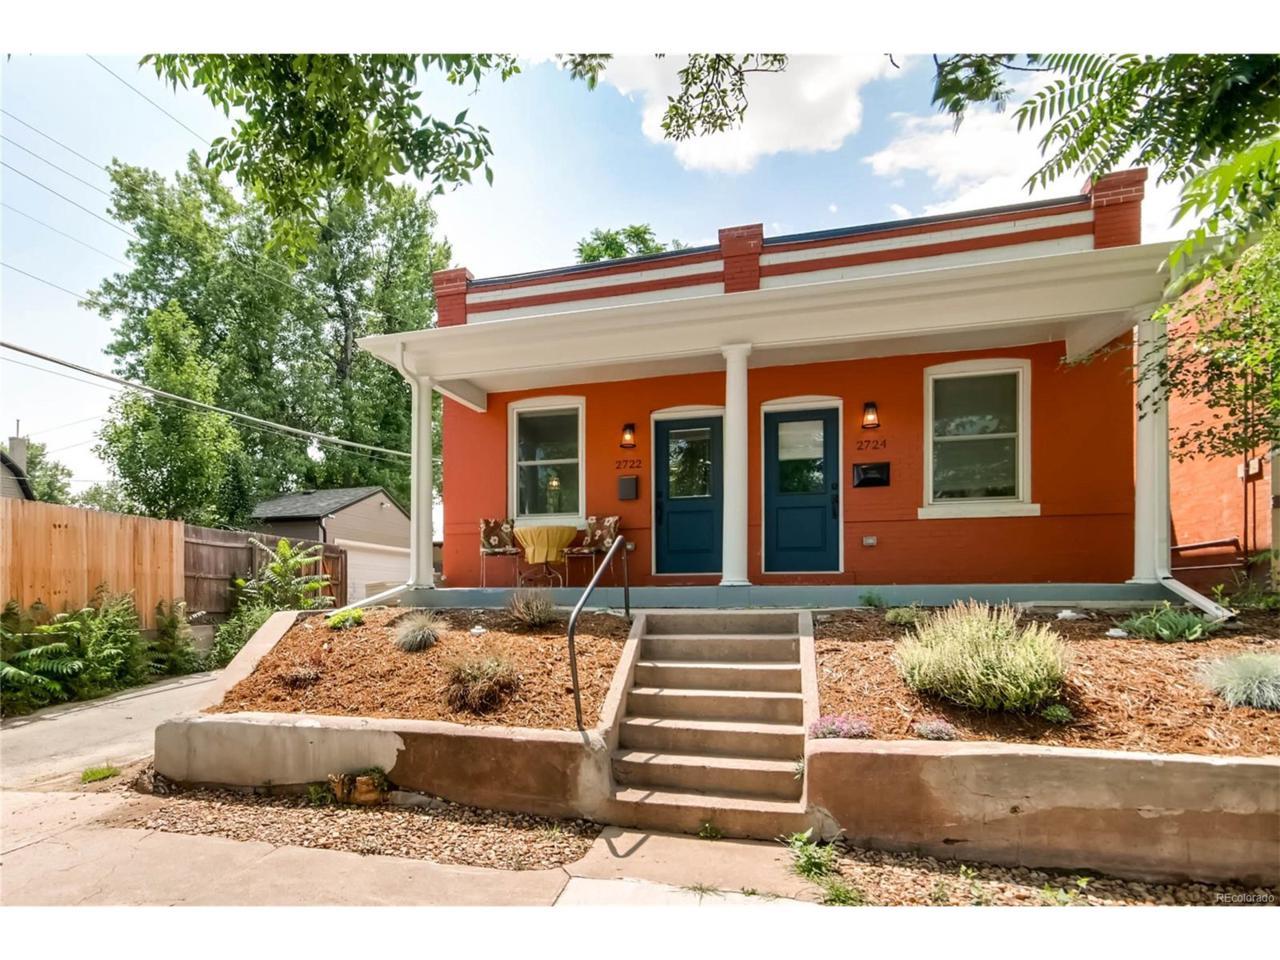 2722 W 33rd Avenue, Denver, CO 80211 (MLS #6229778) :: 8z Real Estate